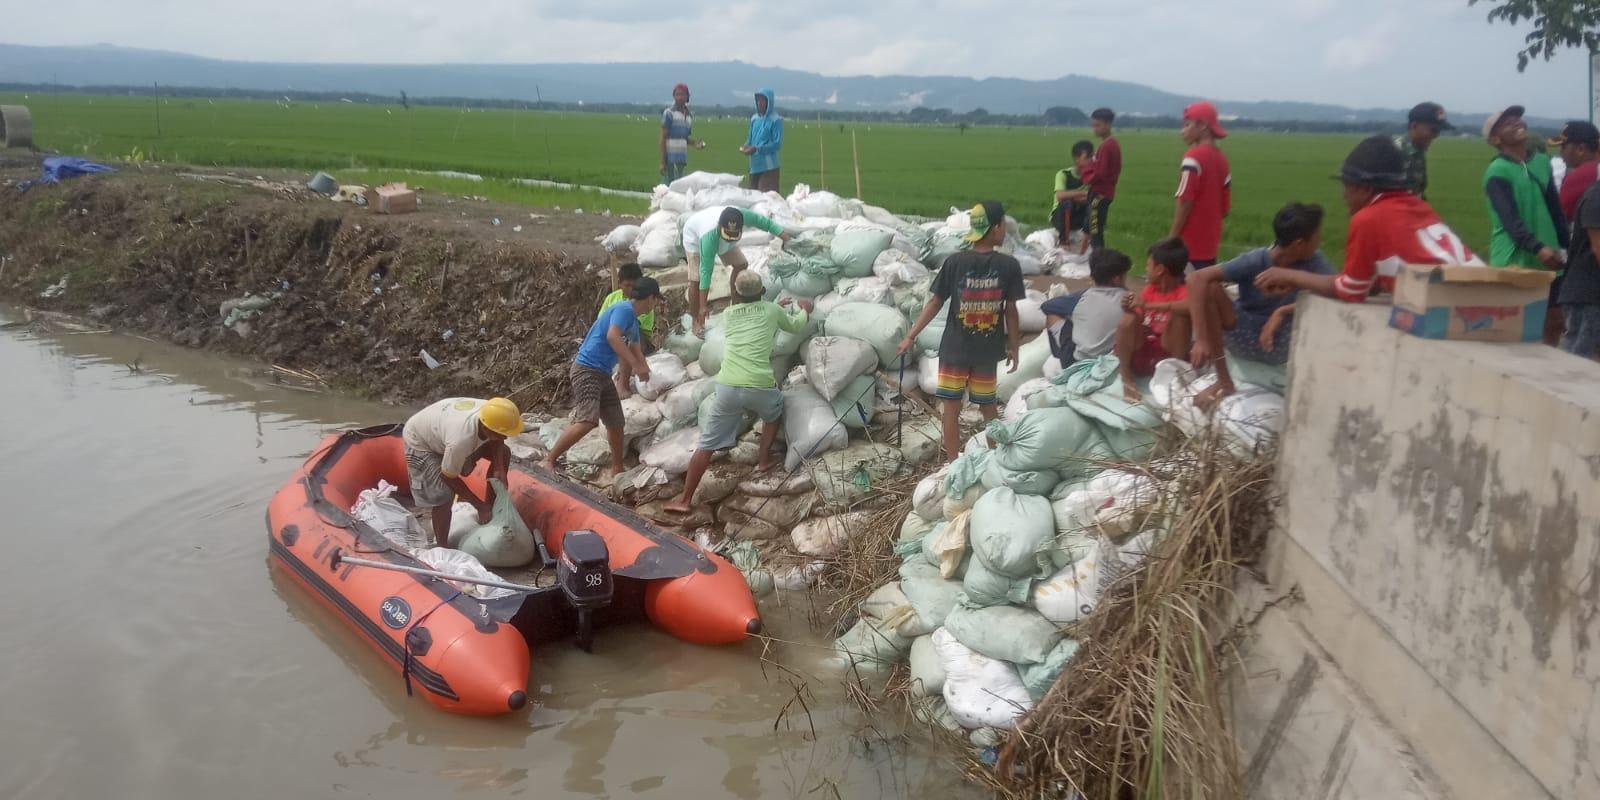 Perbaikan tanggul Sungai Ingas, Bojonegoro yang sempat jebol Senin (14/12) lalu dan mengakibatkan banjir. (Foto: Agus Setiawan/Tugu Jatim)